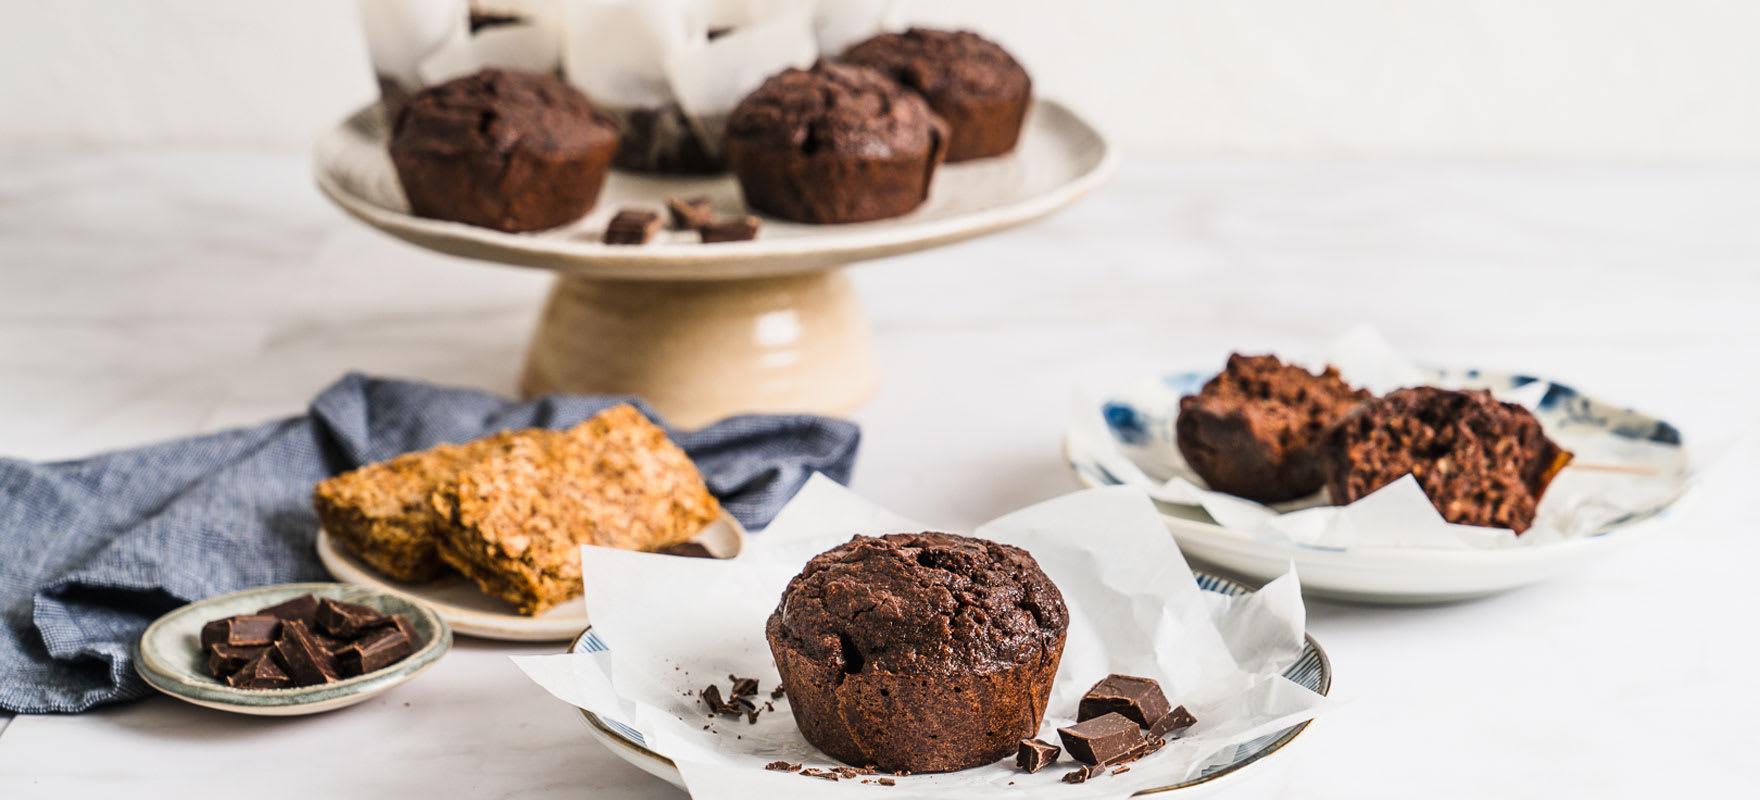 Gluten free chocolate muffins image 1